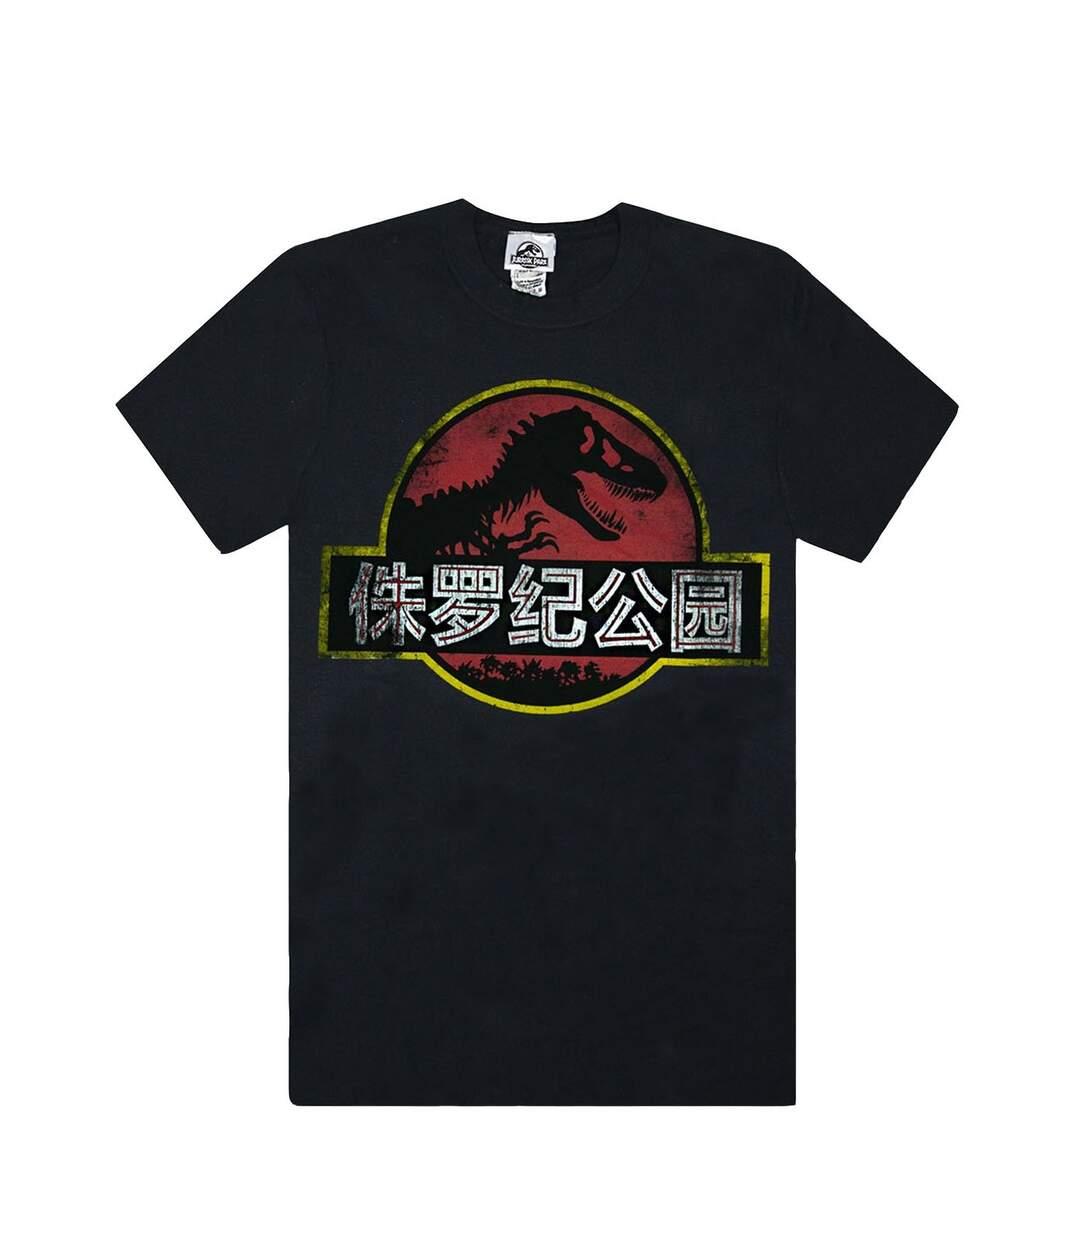 Jurassic Park Mens Chinese Distressed Logo T-shirt (Black) - UTNS5375